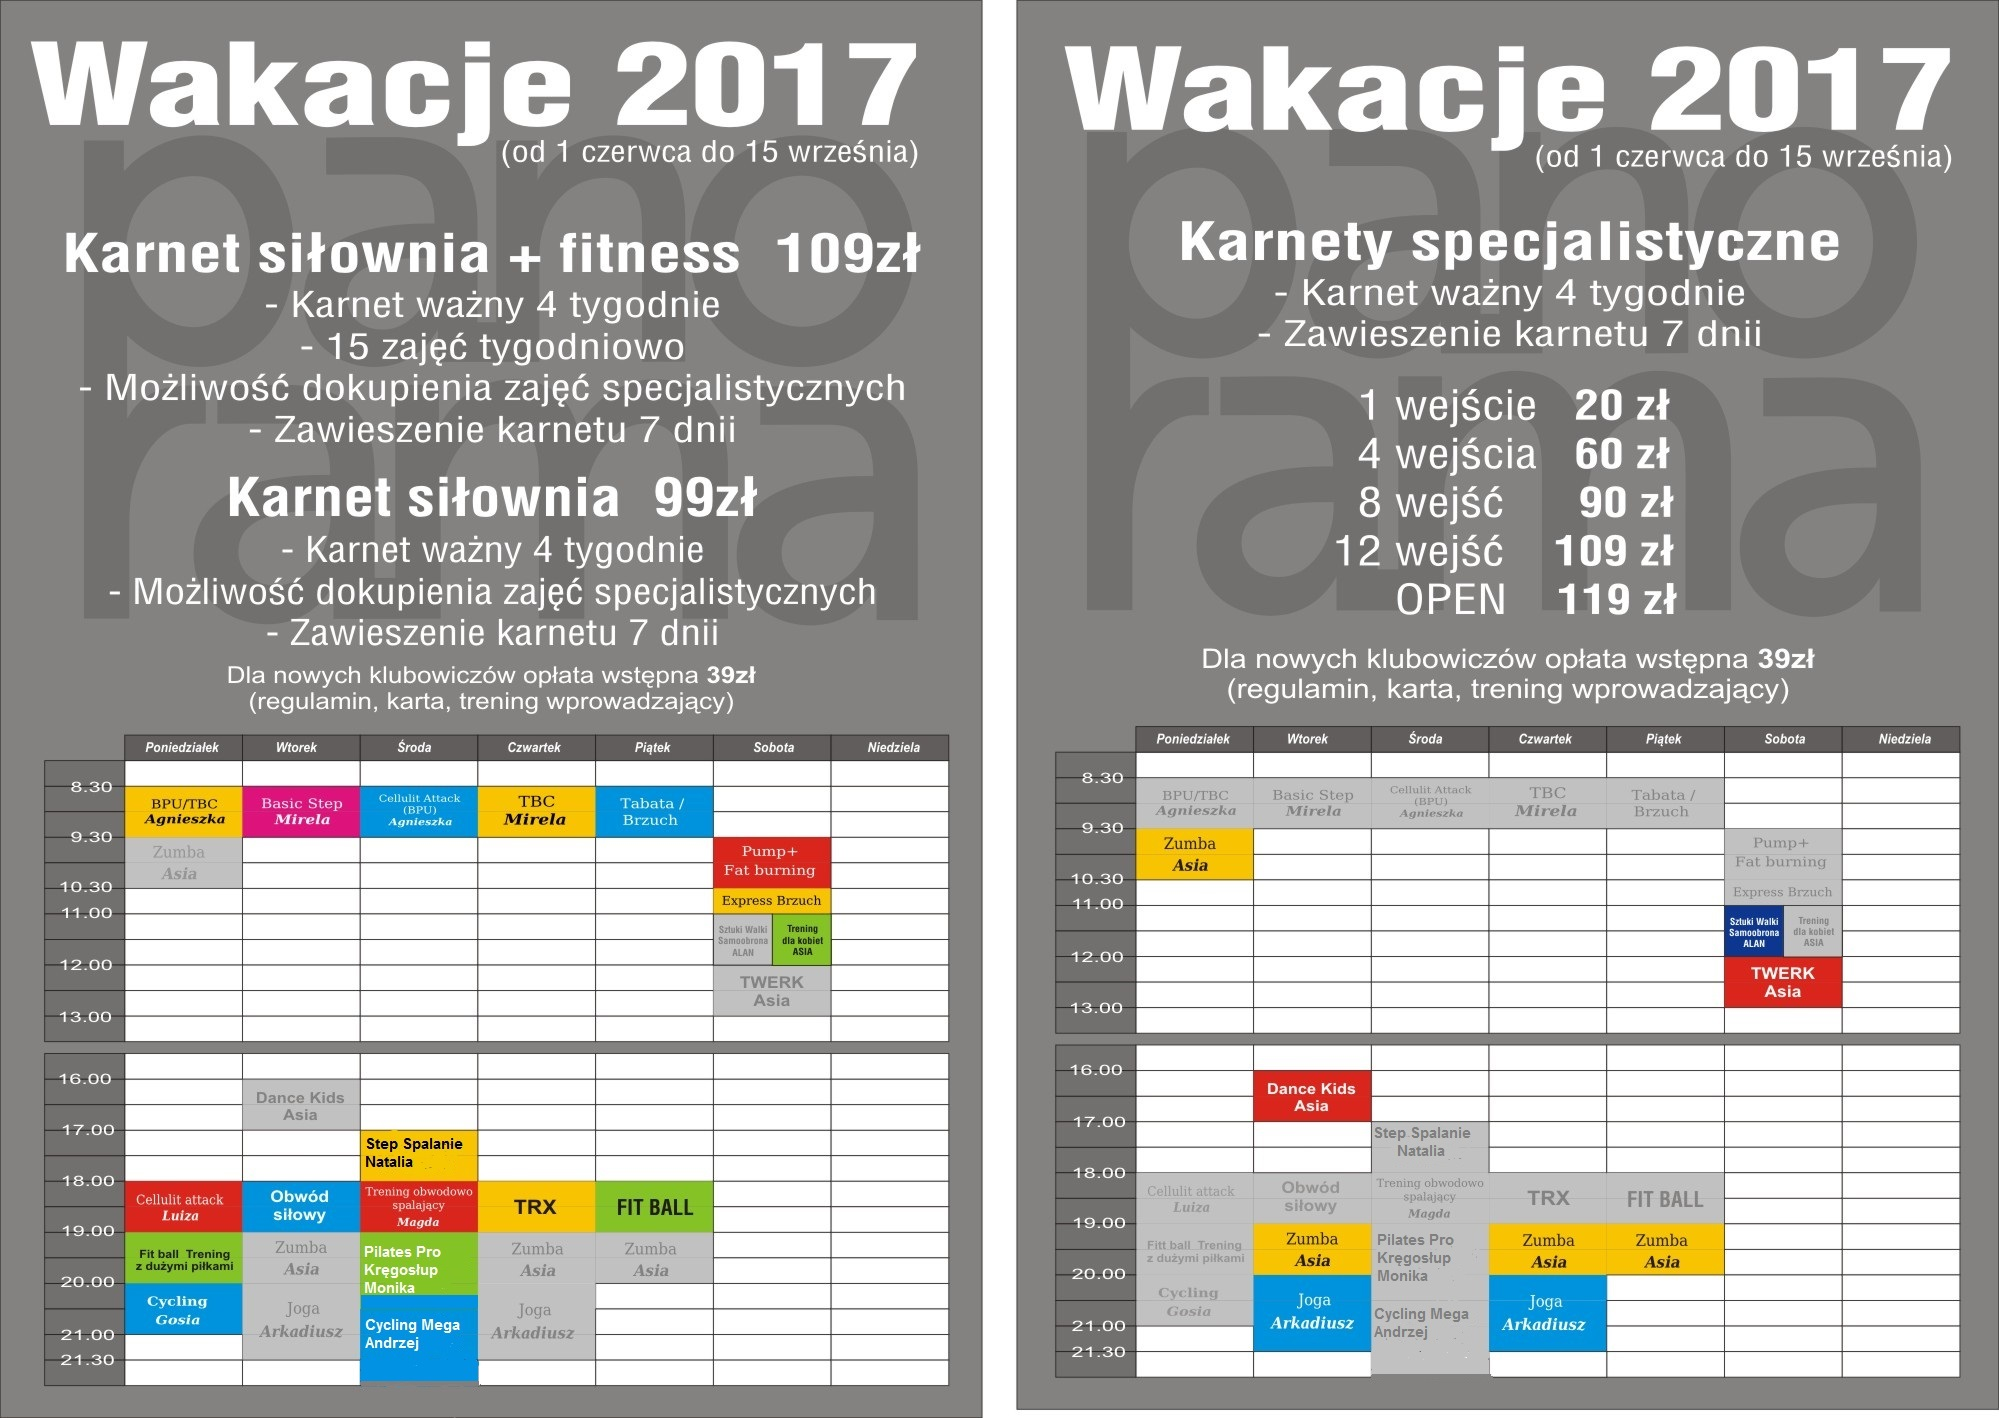 GRAFIK-WAKACJE 2017